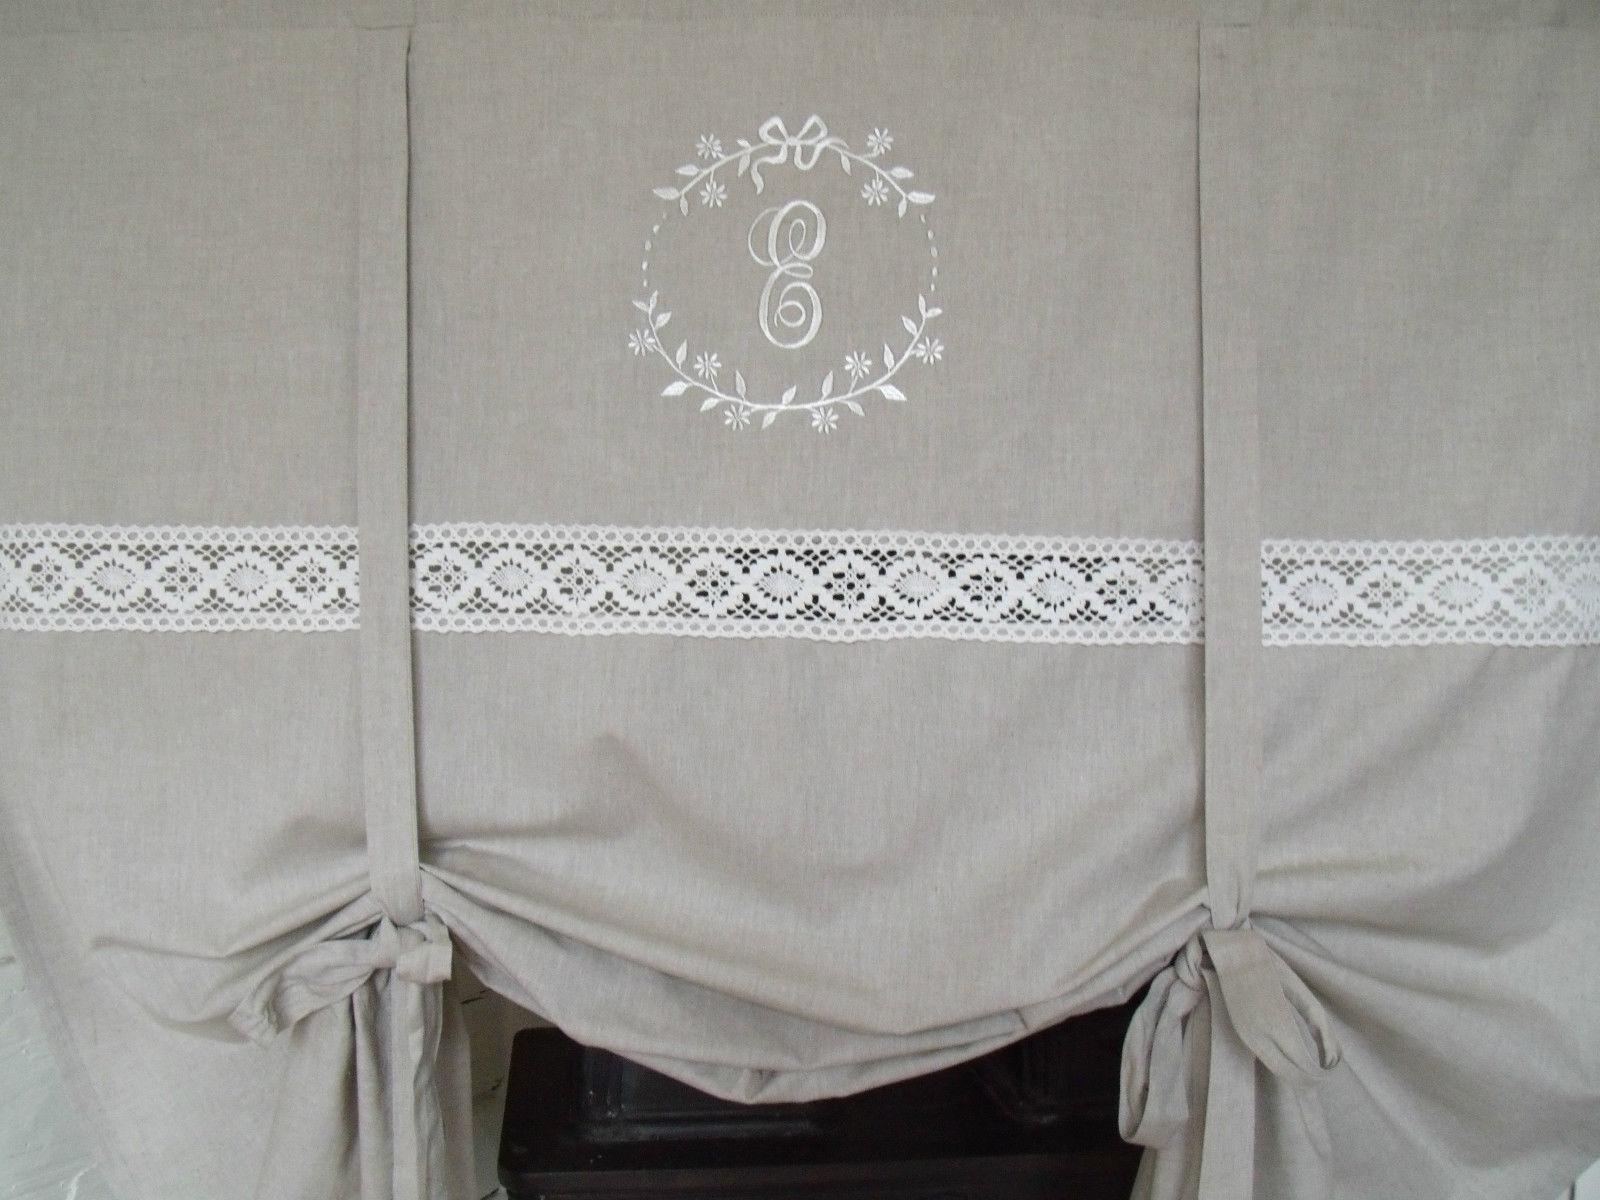 Raff gardine crystal sand 100x120 cm raffgardinen rollos gardinen zauberhafter landhausstil - Raffgardinen landhausstil ...